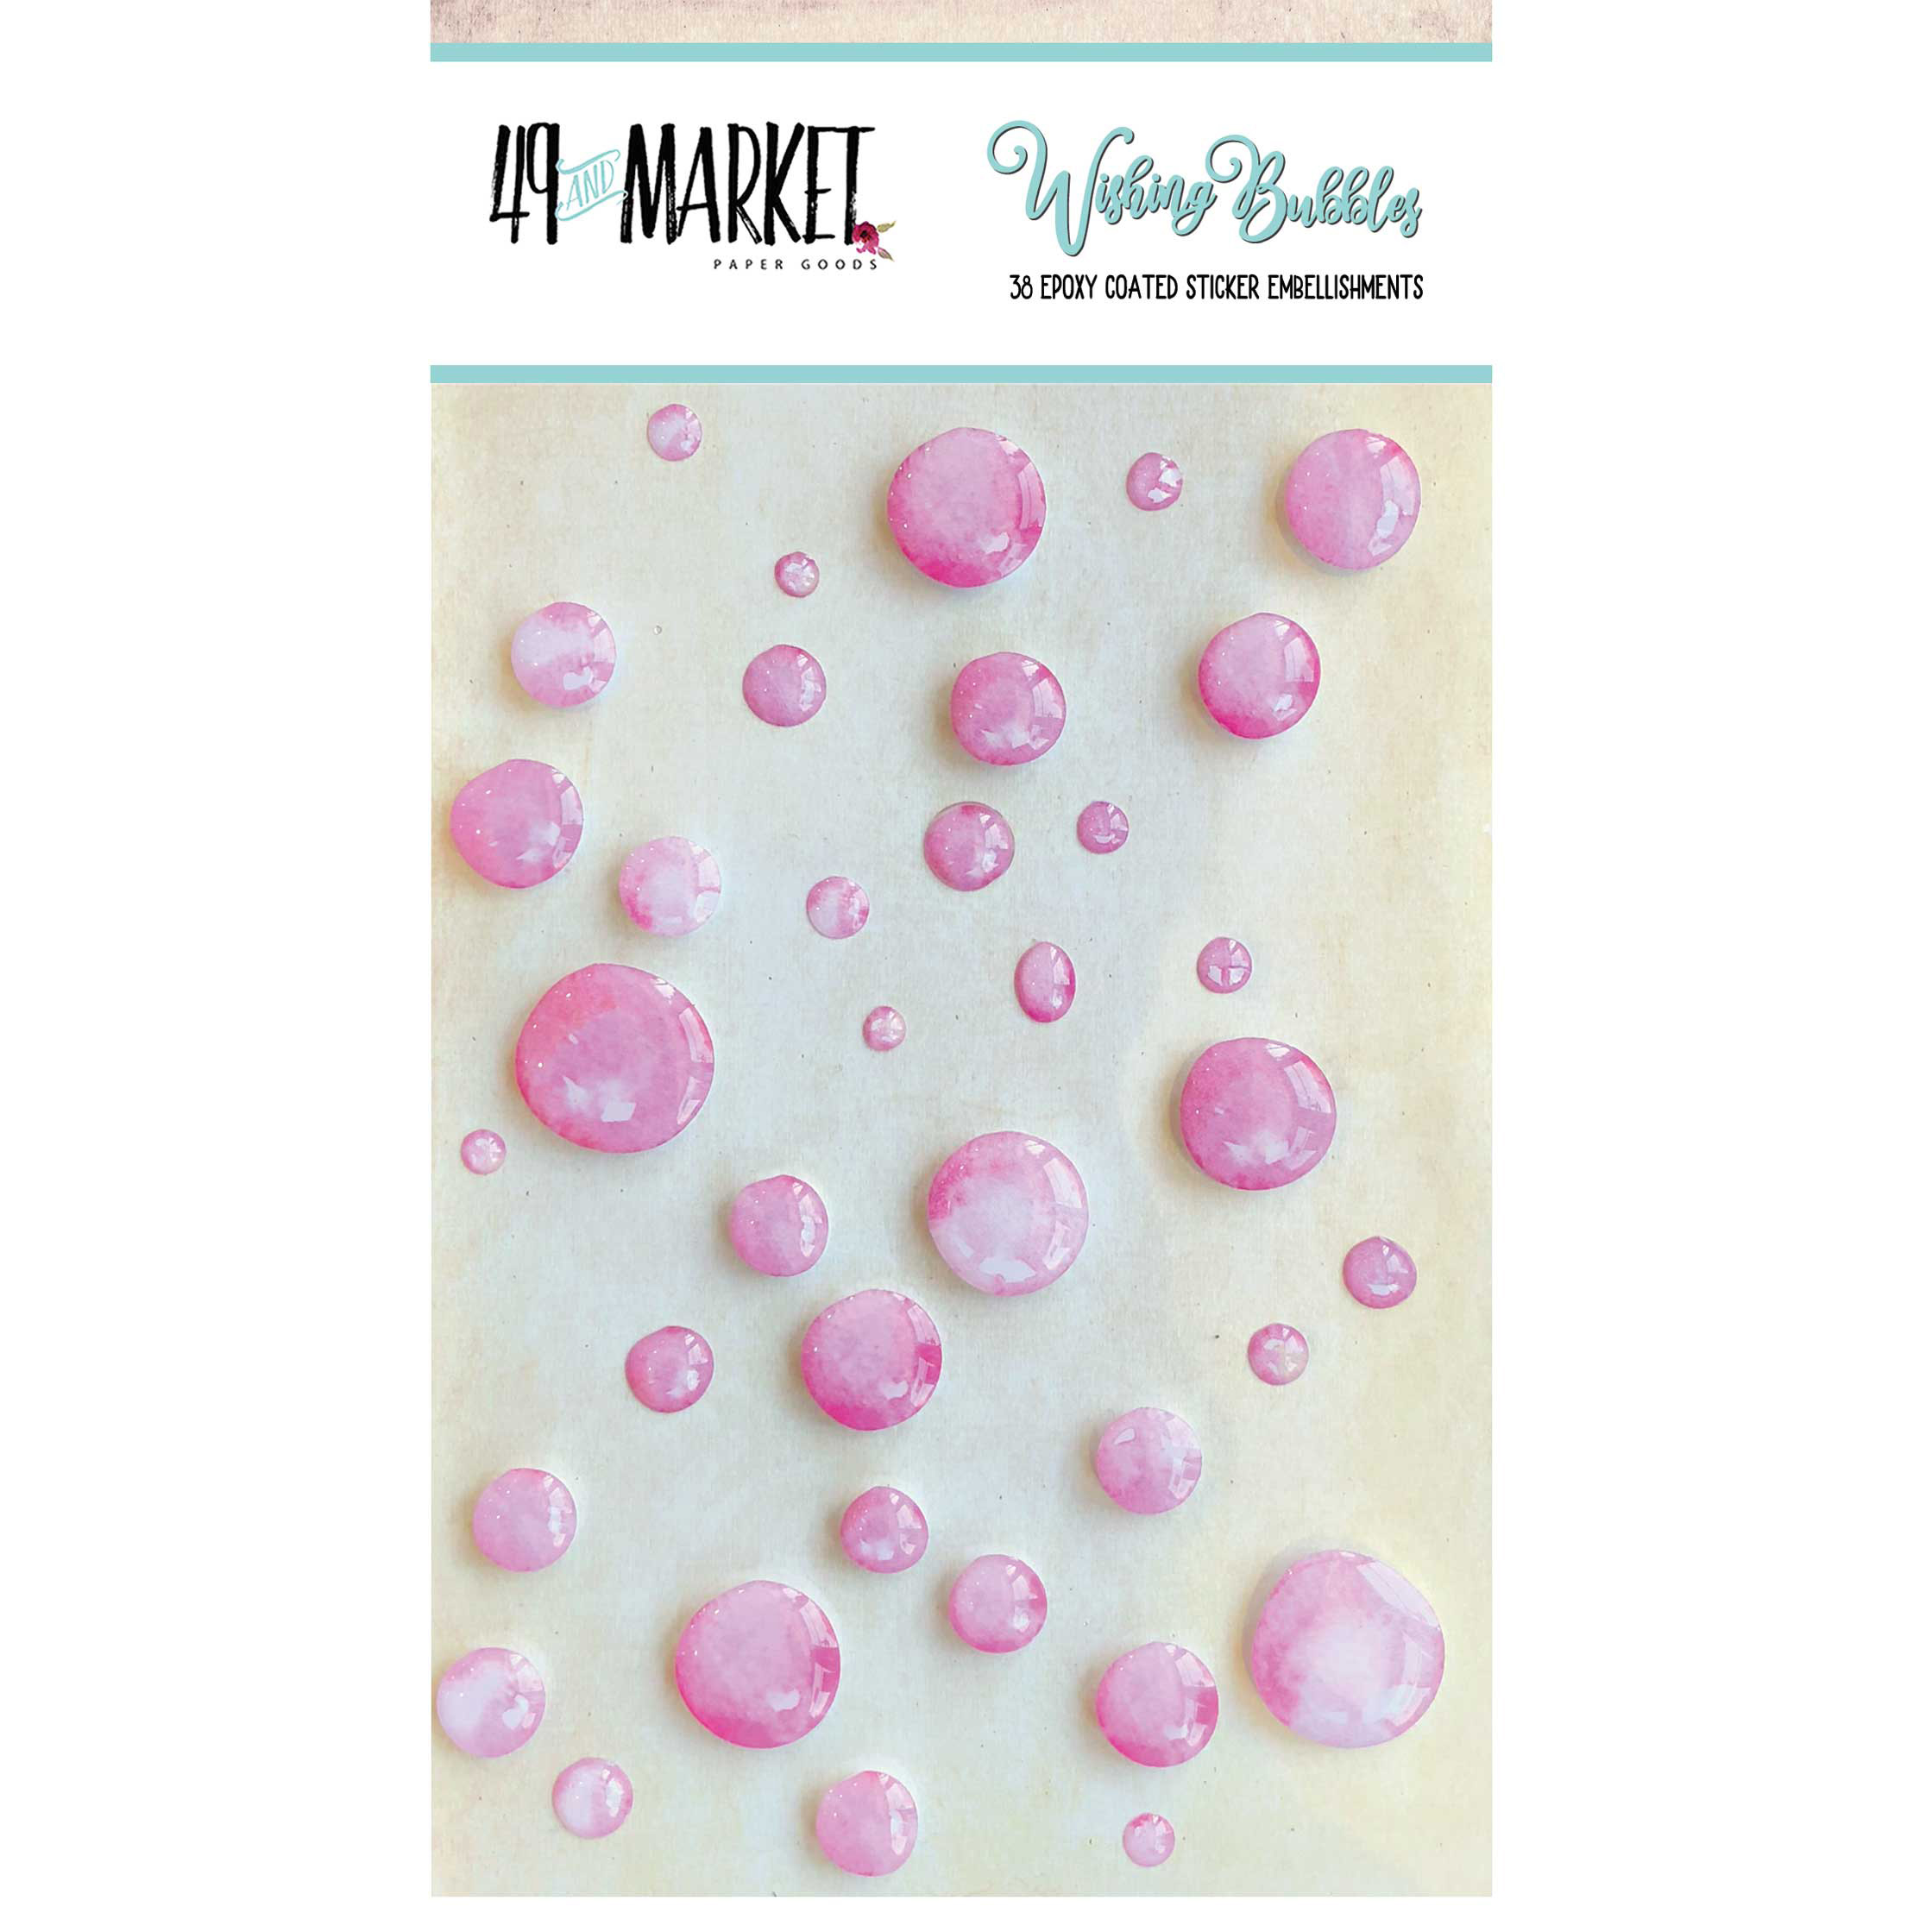 49 & Market Bubblegum Wishing Bubbles